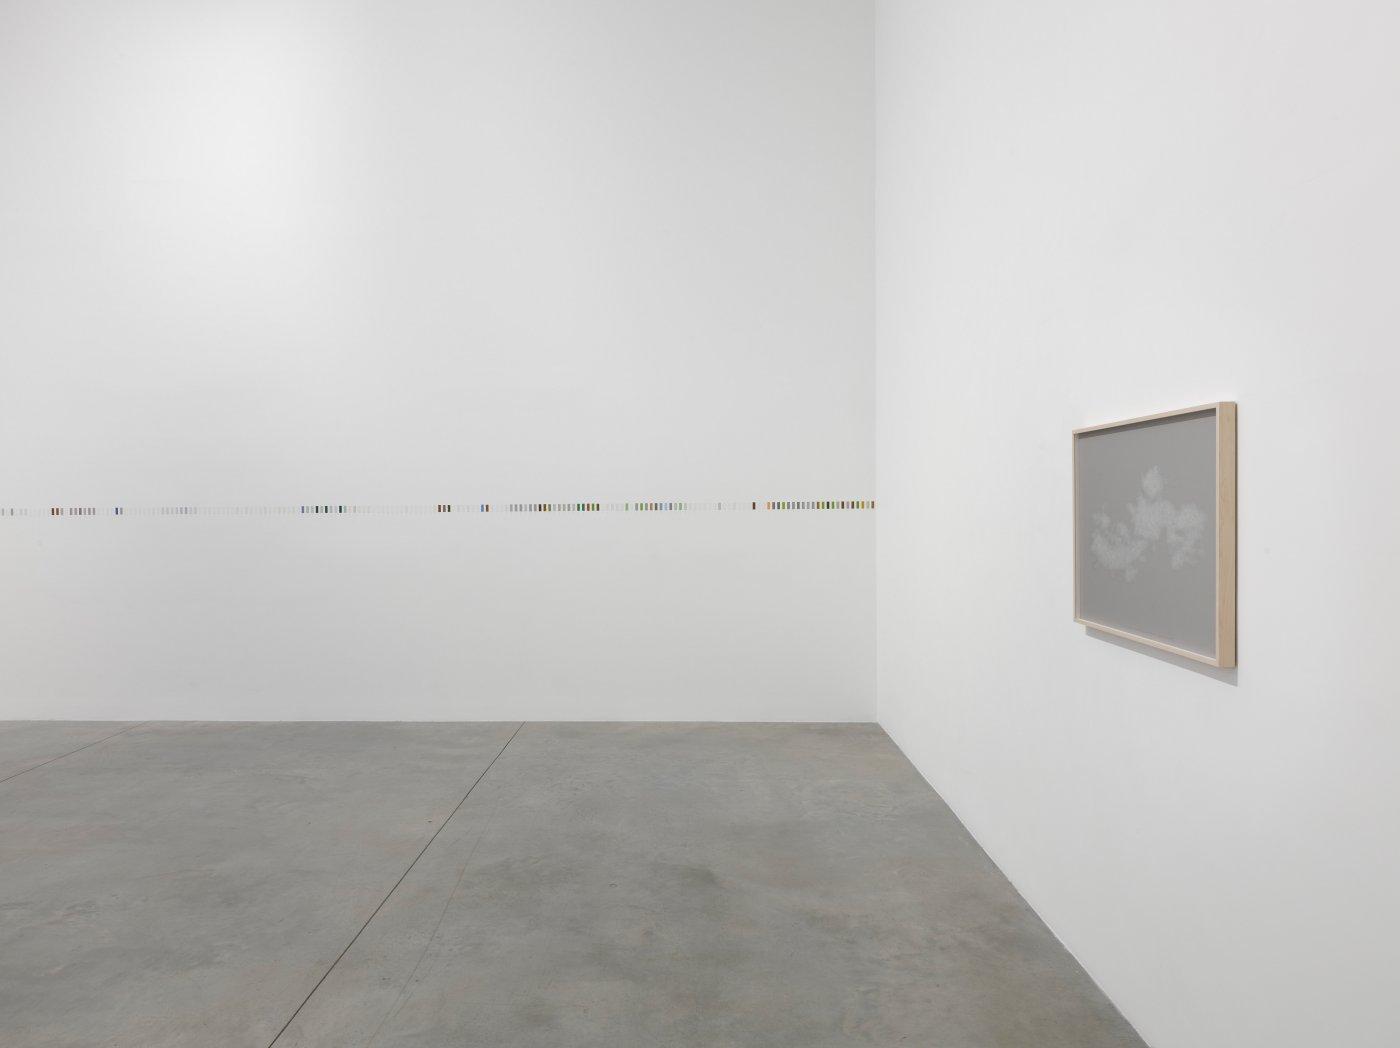 Lisson Gallery Bell Street Spencer Finch 2